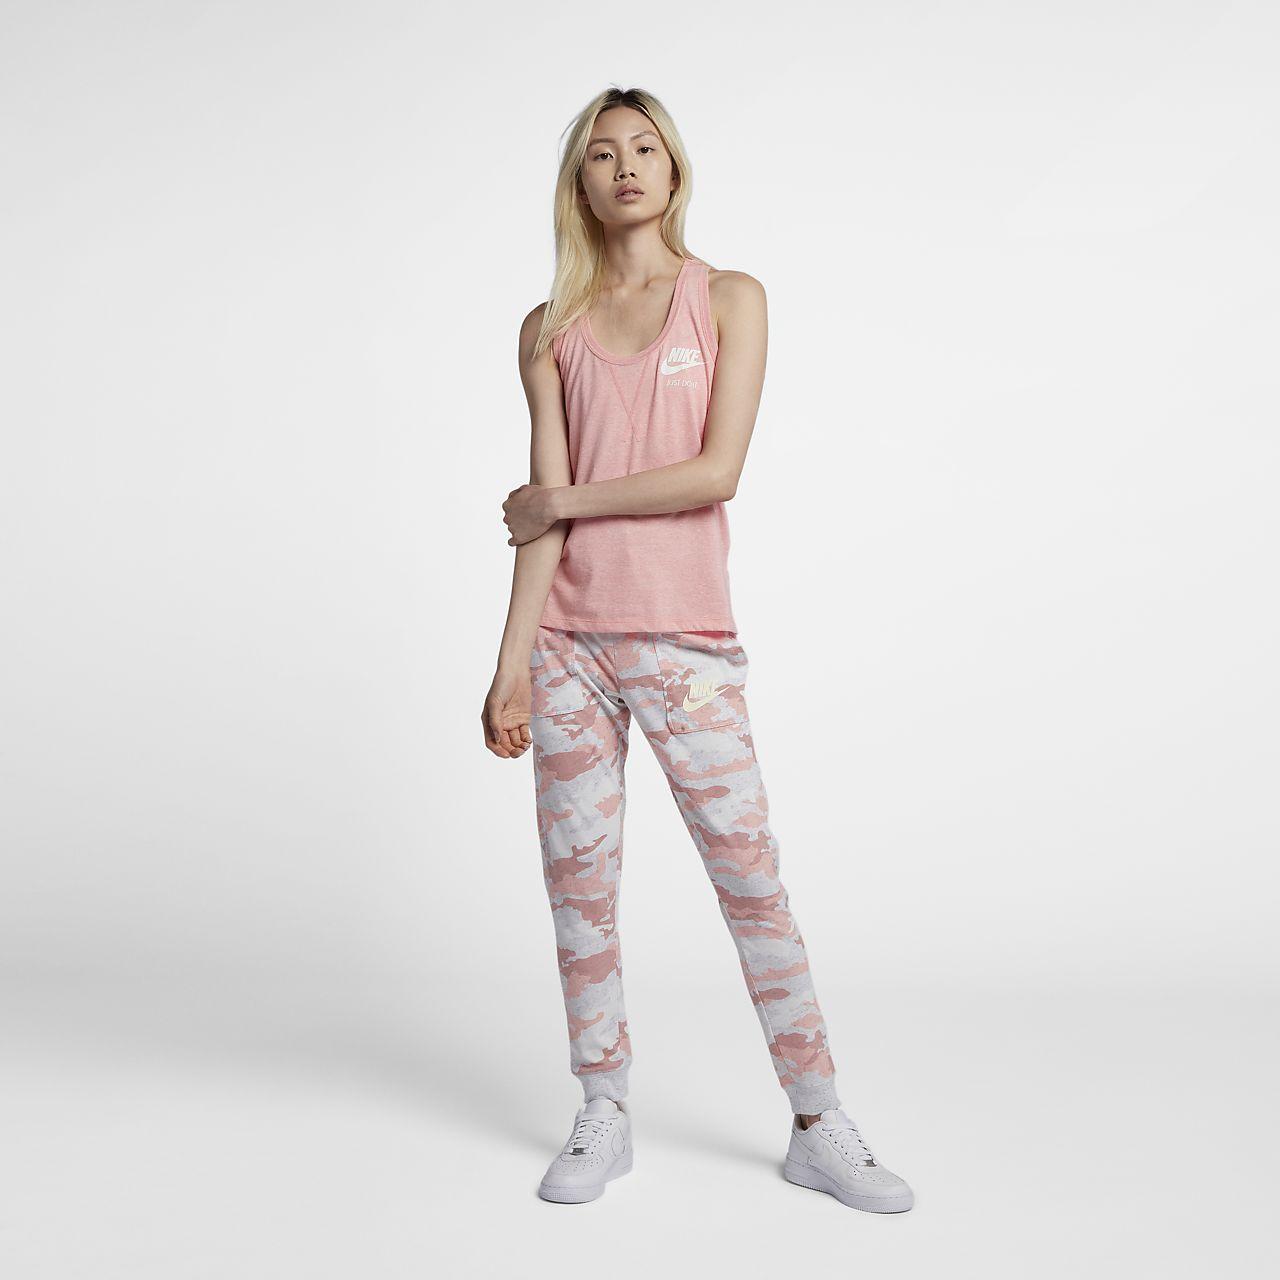 b54a2c13d3 Nike Sportswear Gym Vintage Women's Camo Trousers. Nike.com CA